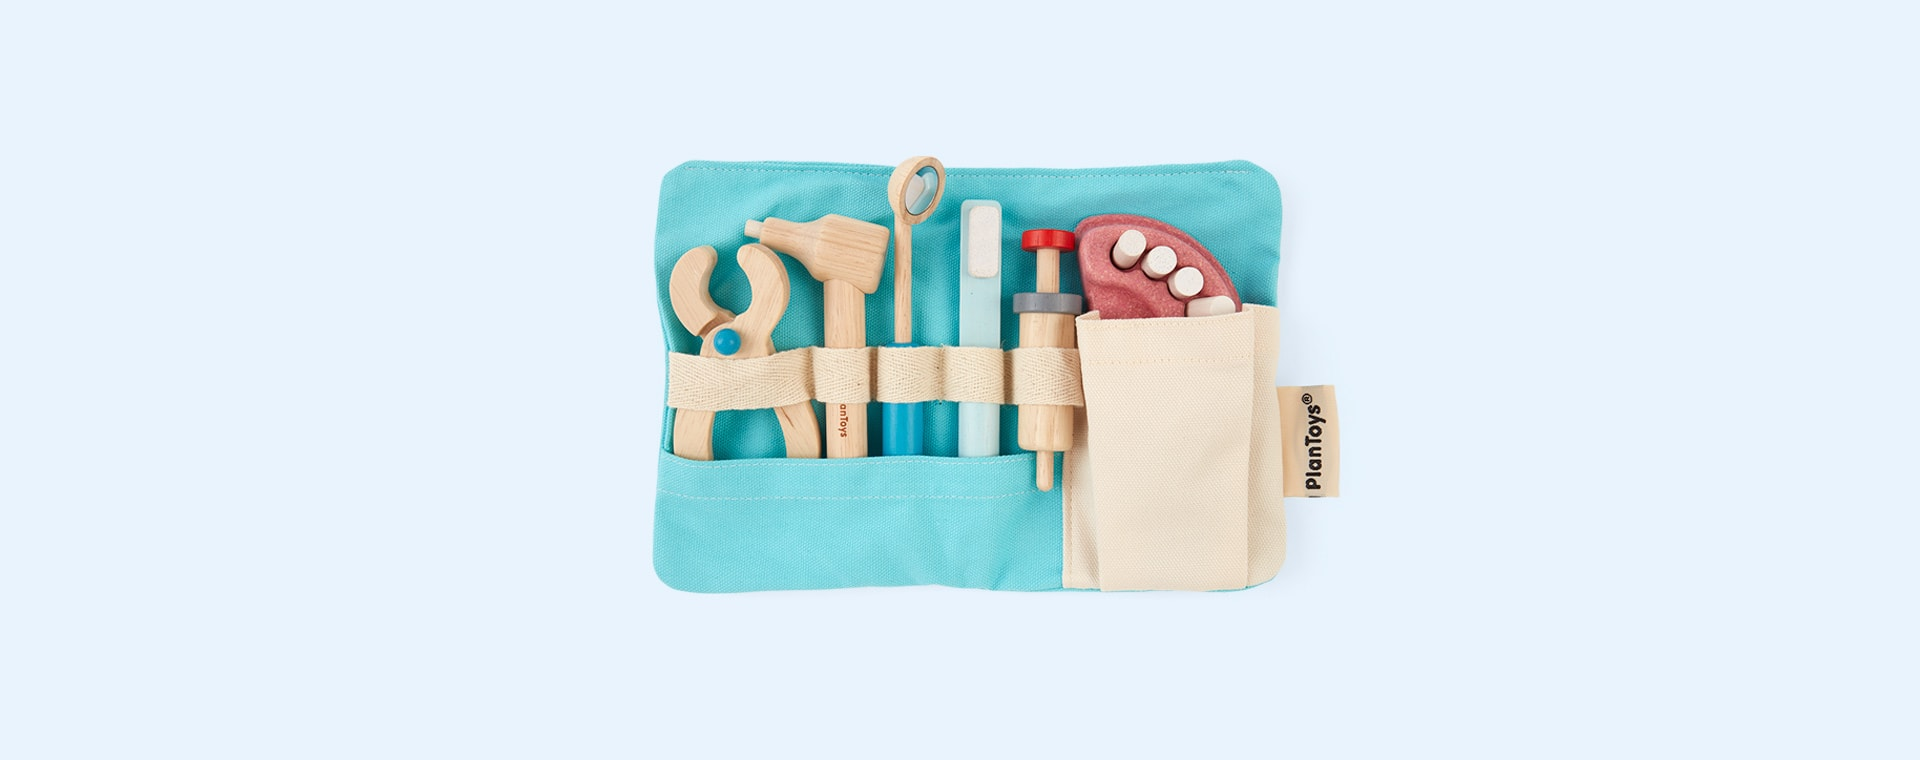 Blue Plan Toys Dentist Set